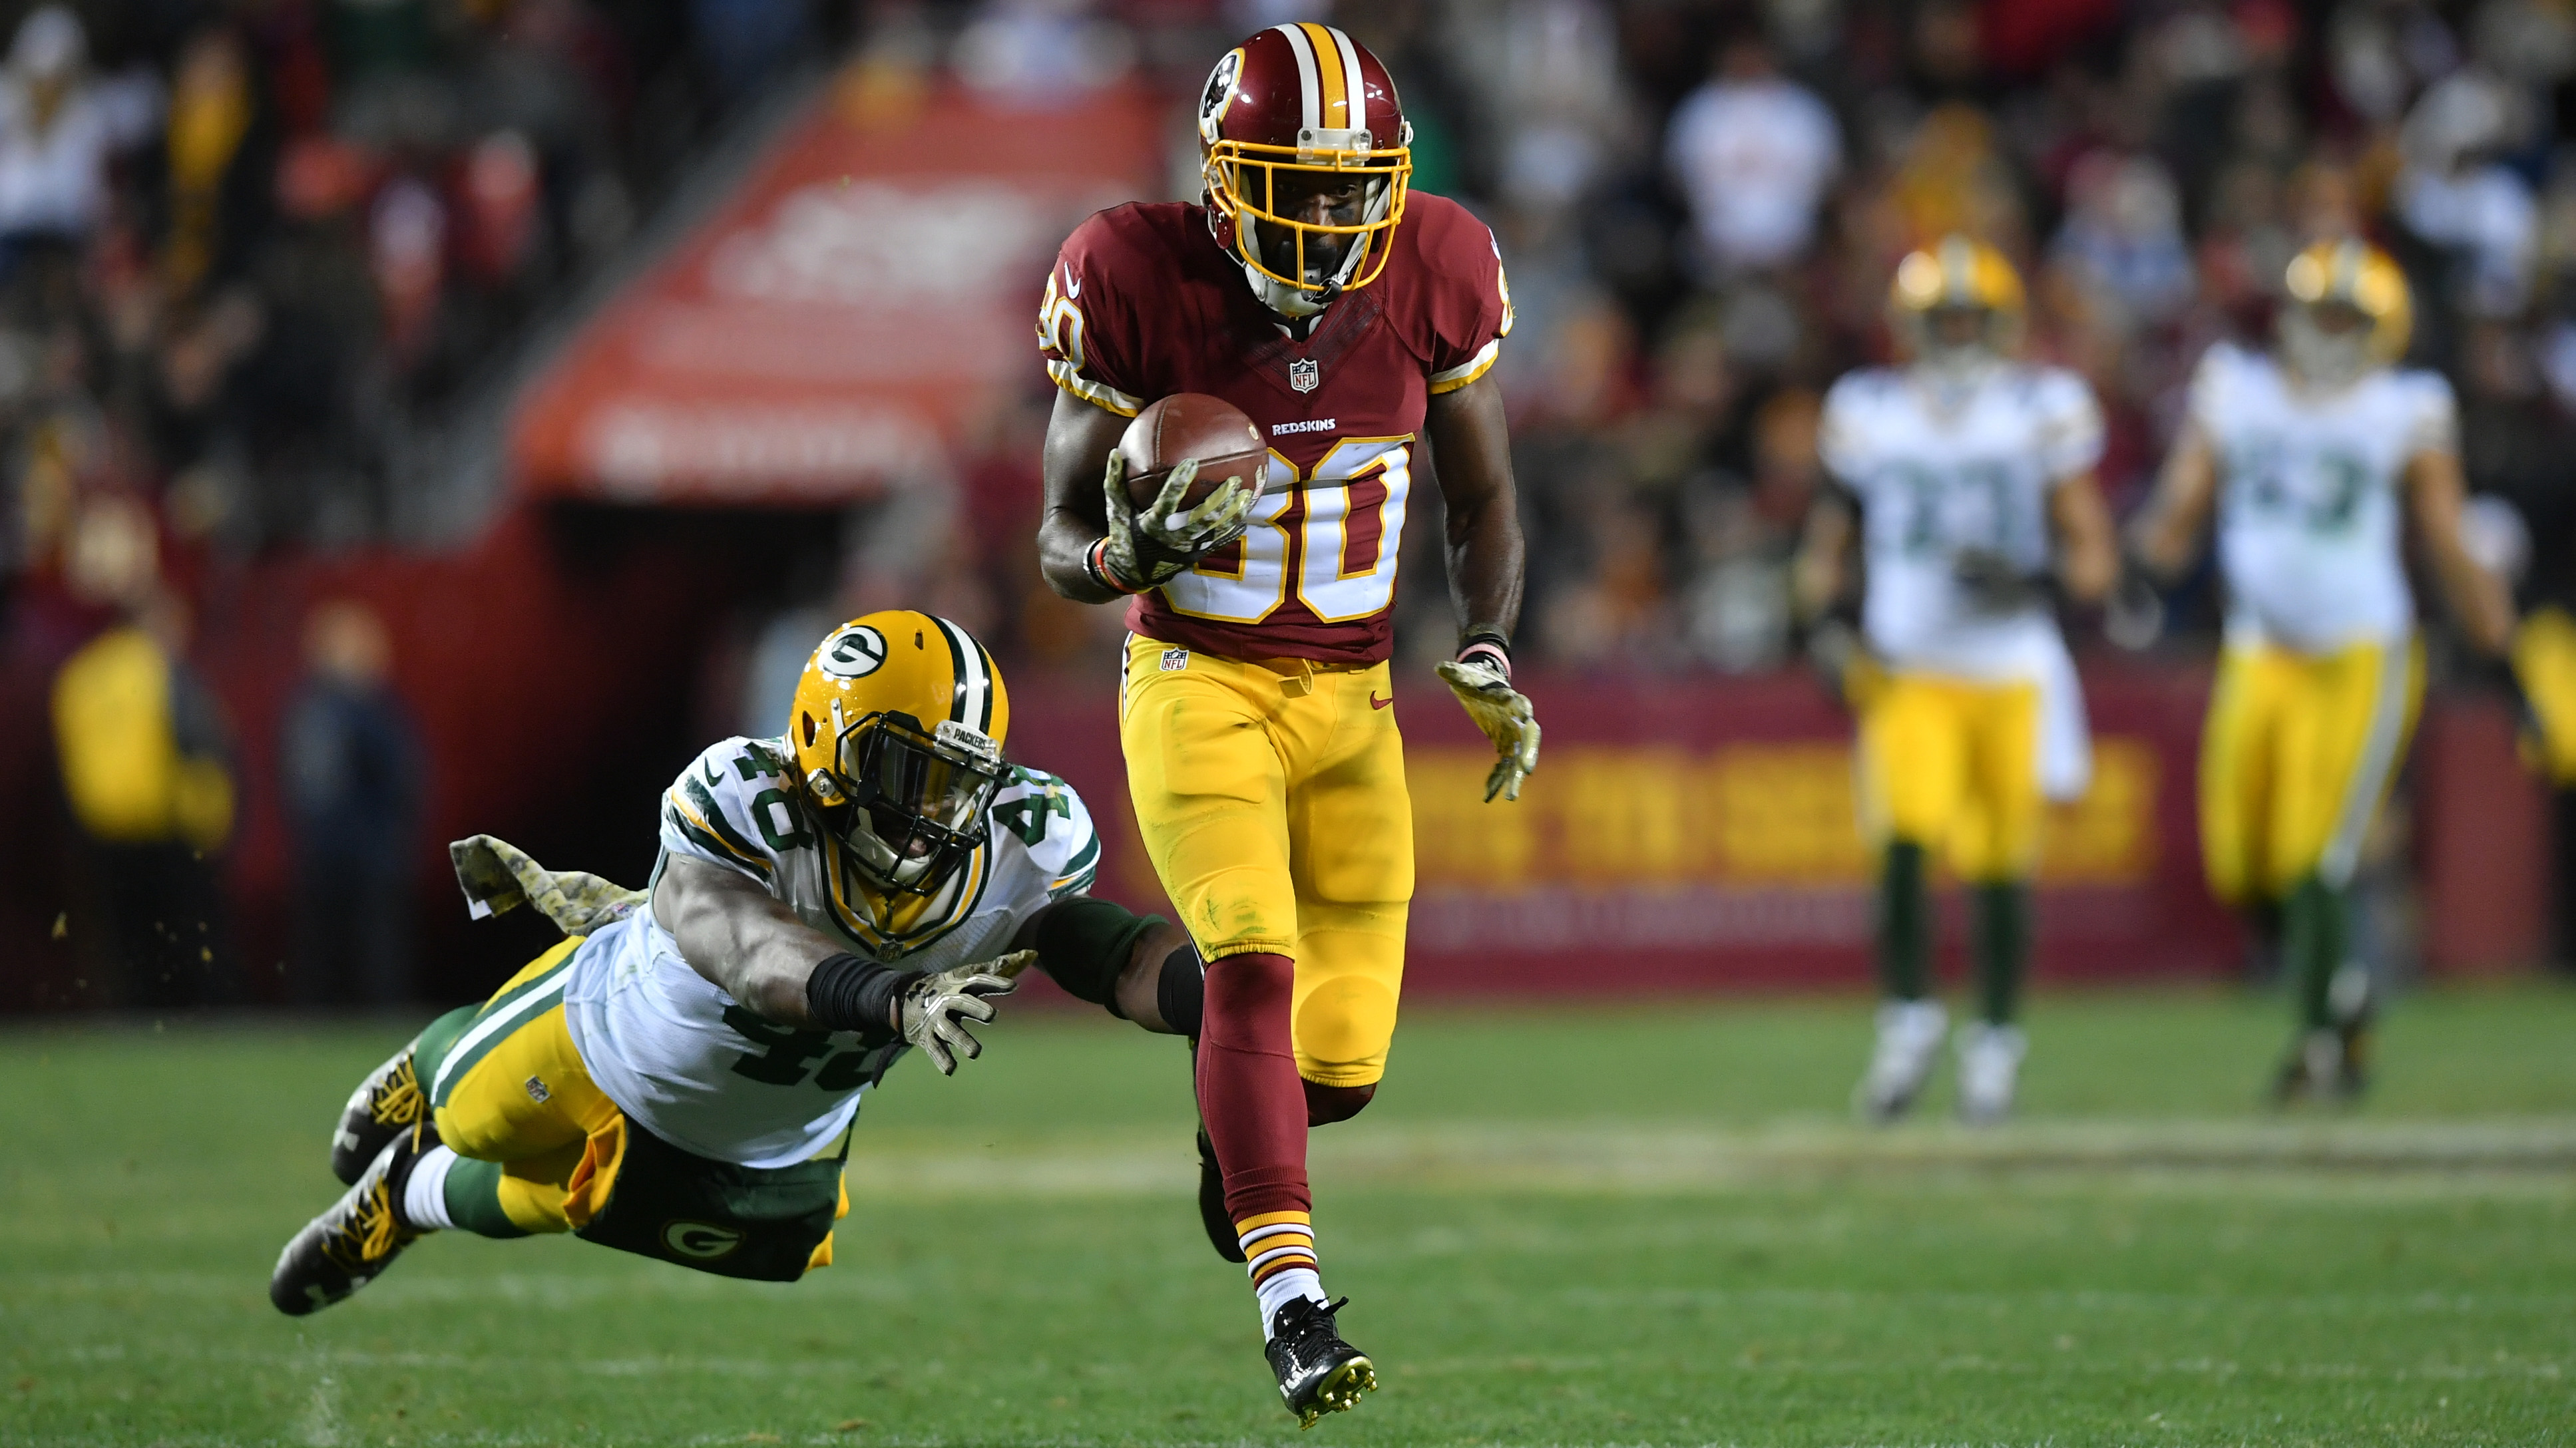 NFL – Greenbay Packers at Washington Redskins